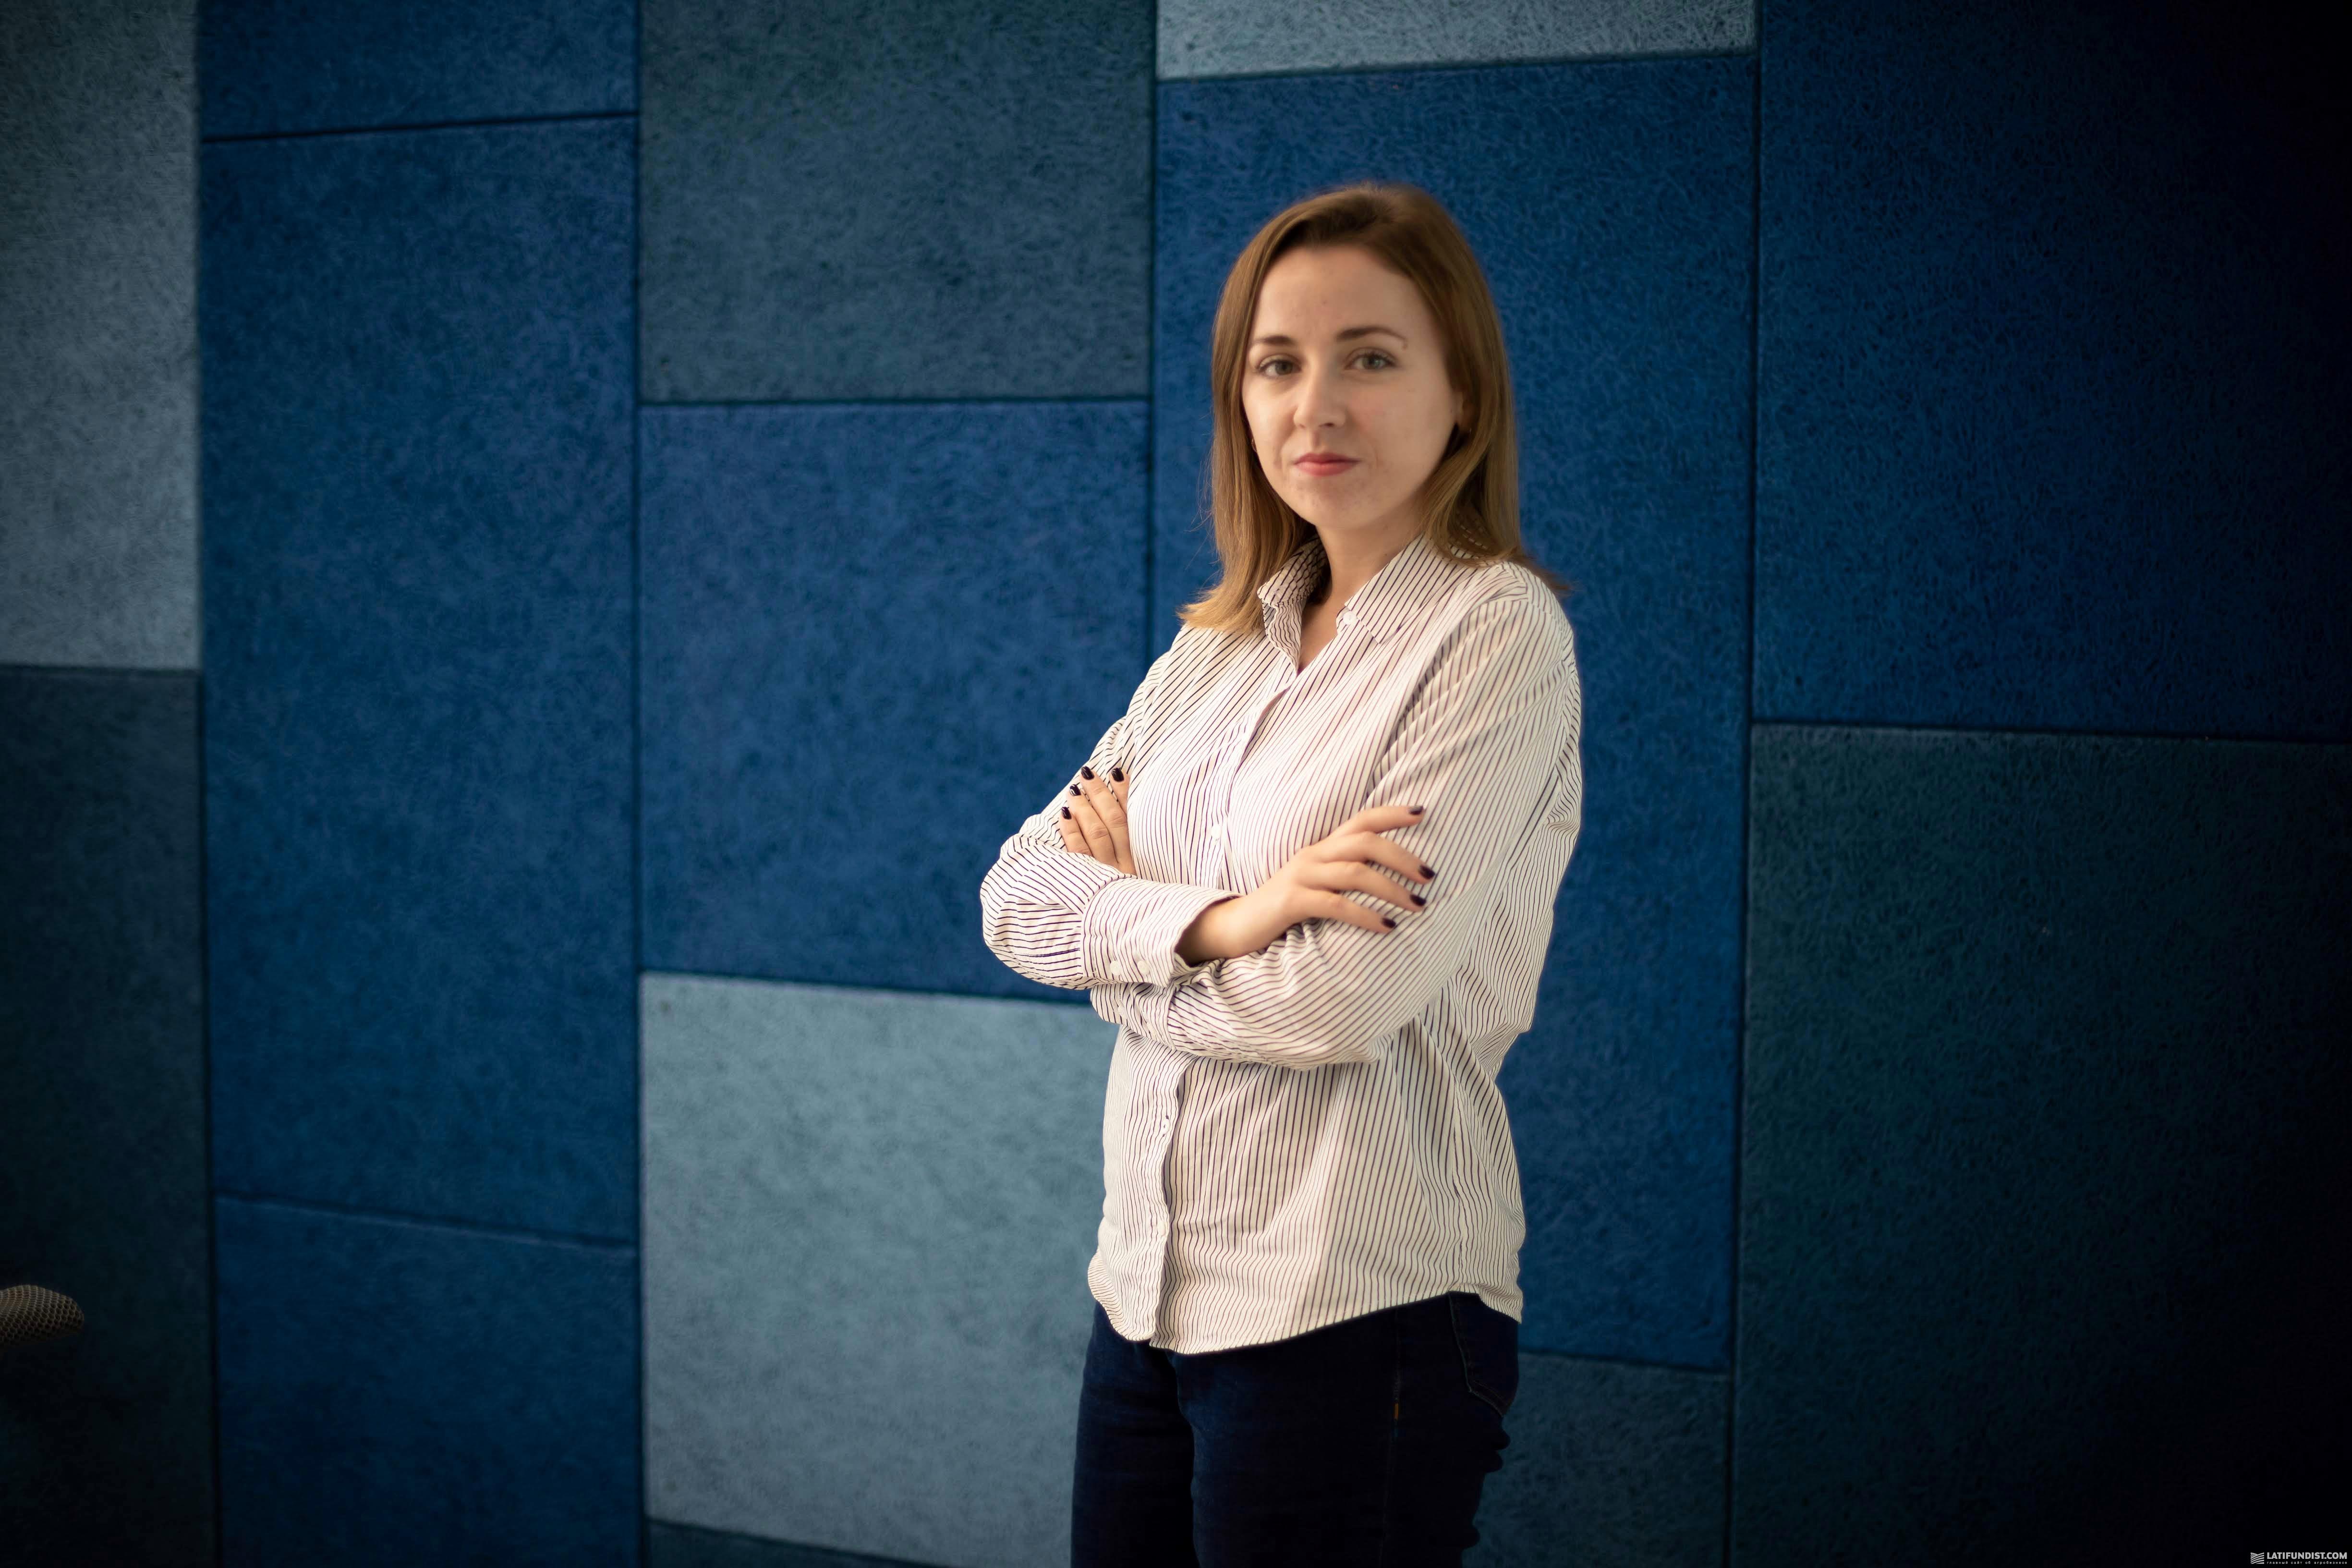 Инна Захарчук, менеджер по развитию бренда работодателя